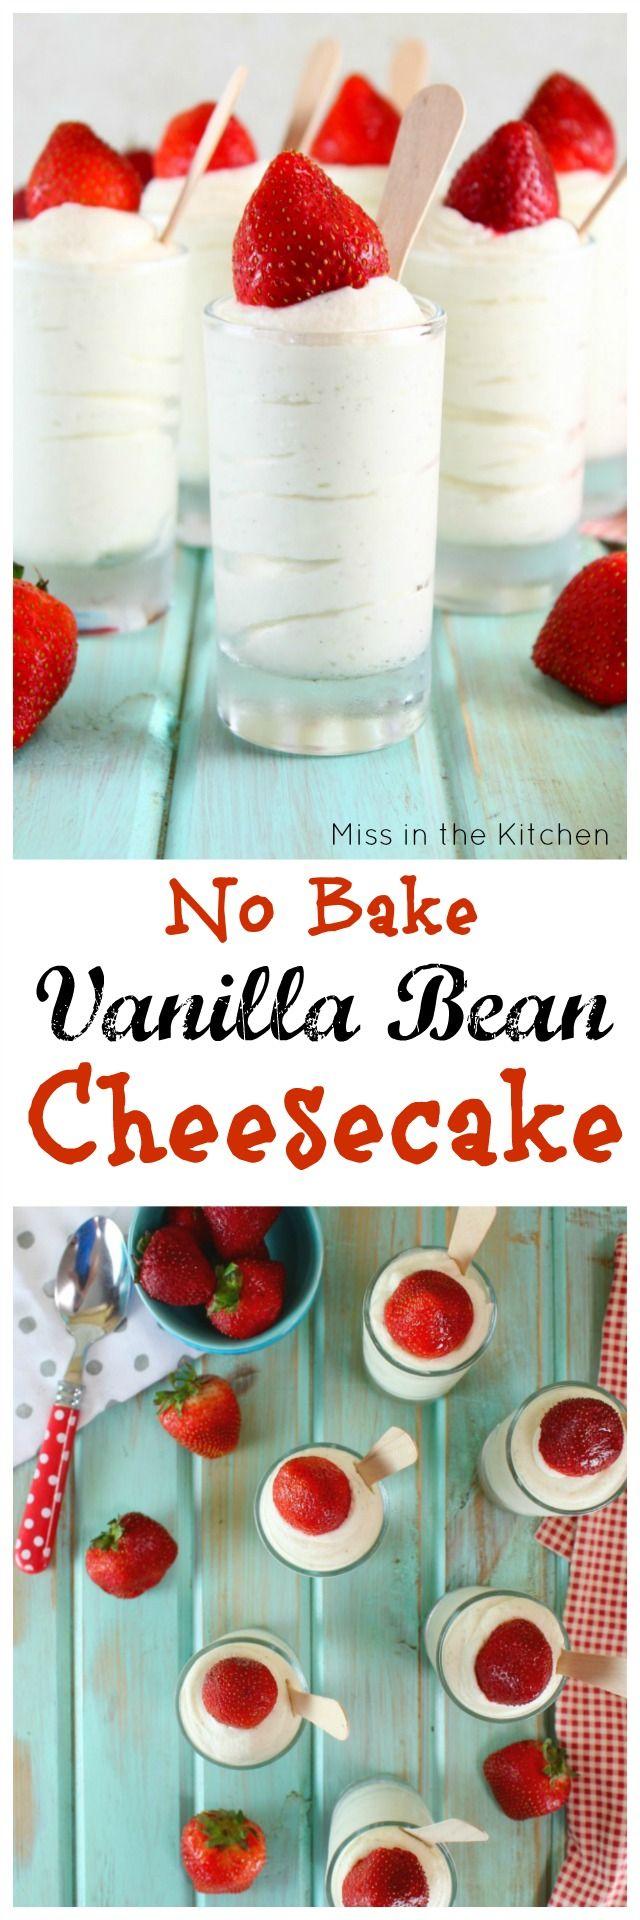 No Bake Vanilla Bean Cheesecake Recipe Easy Dessert For Entertaining Missinthekitchen Com